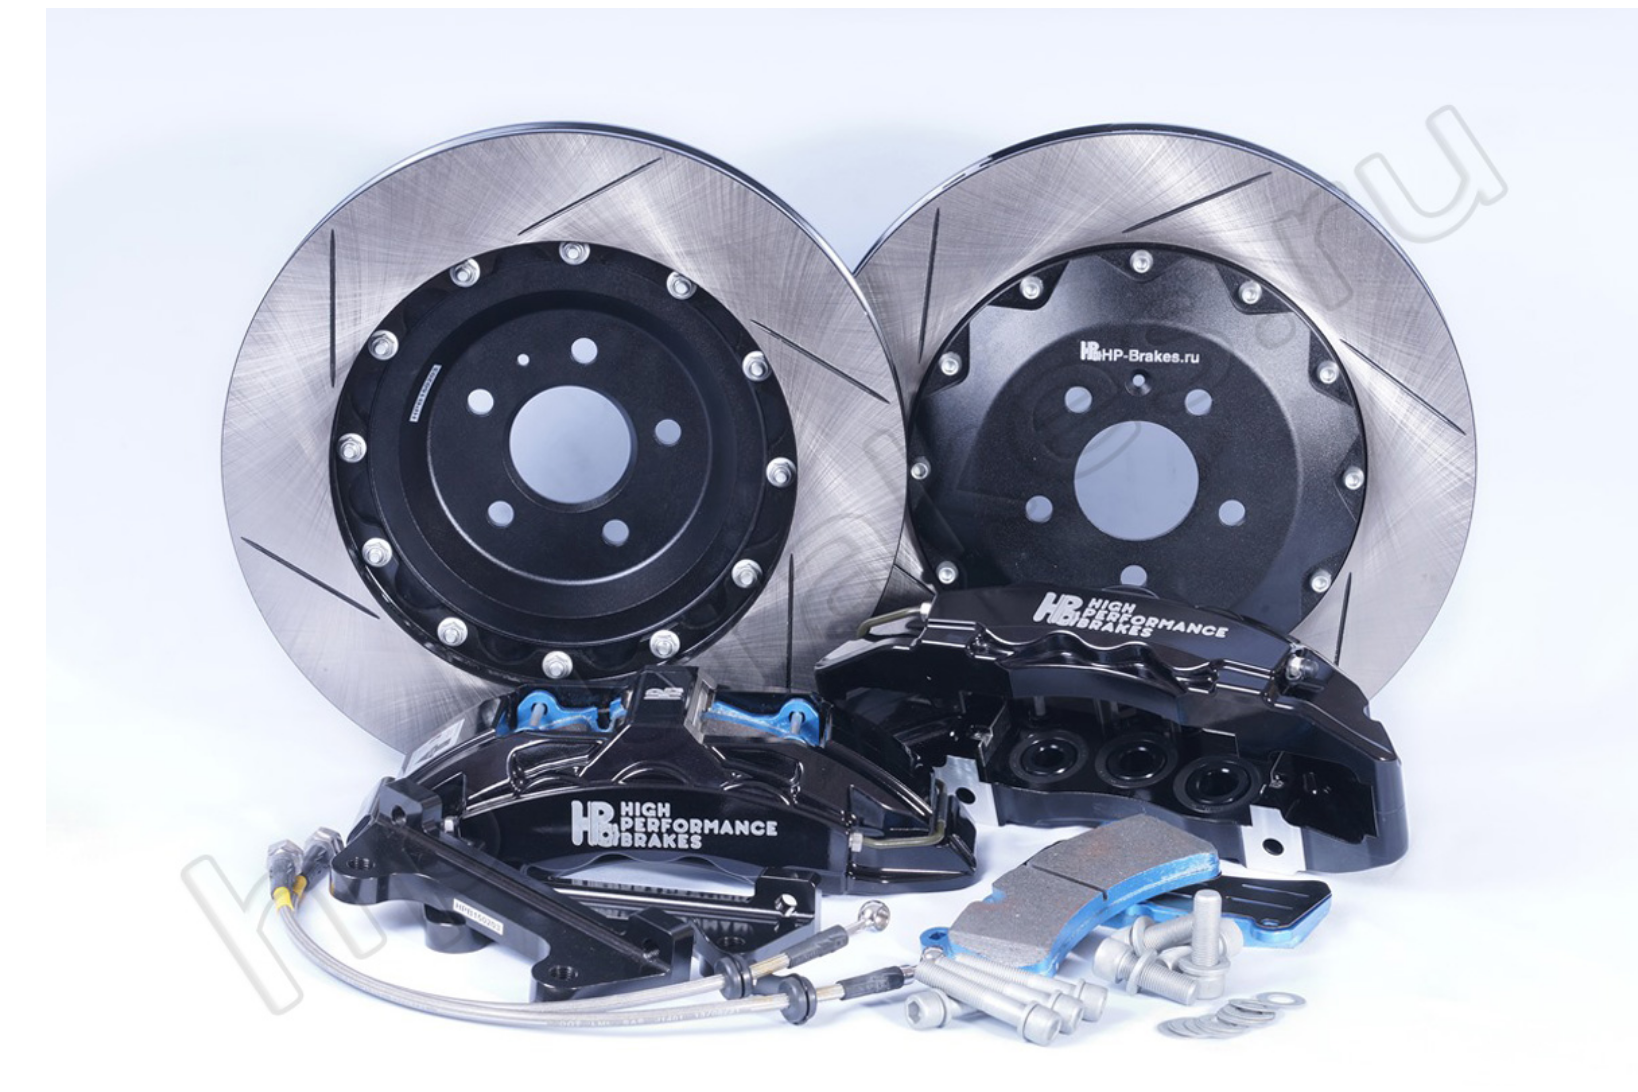 Тормозная система HP Brakes (Передняя ось, D19, 6 поршней, диск 380х34мм)